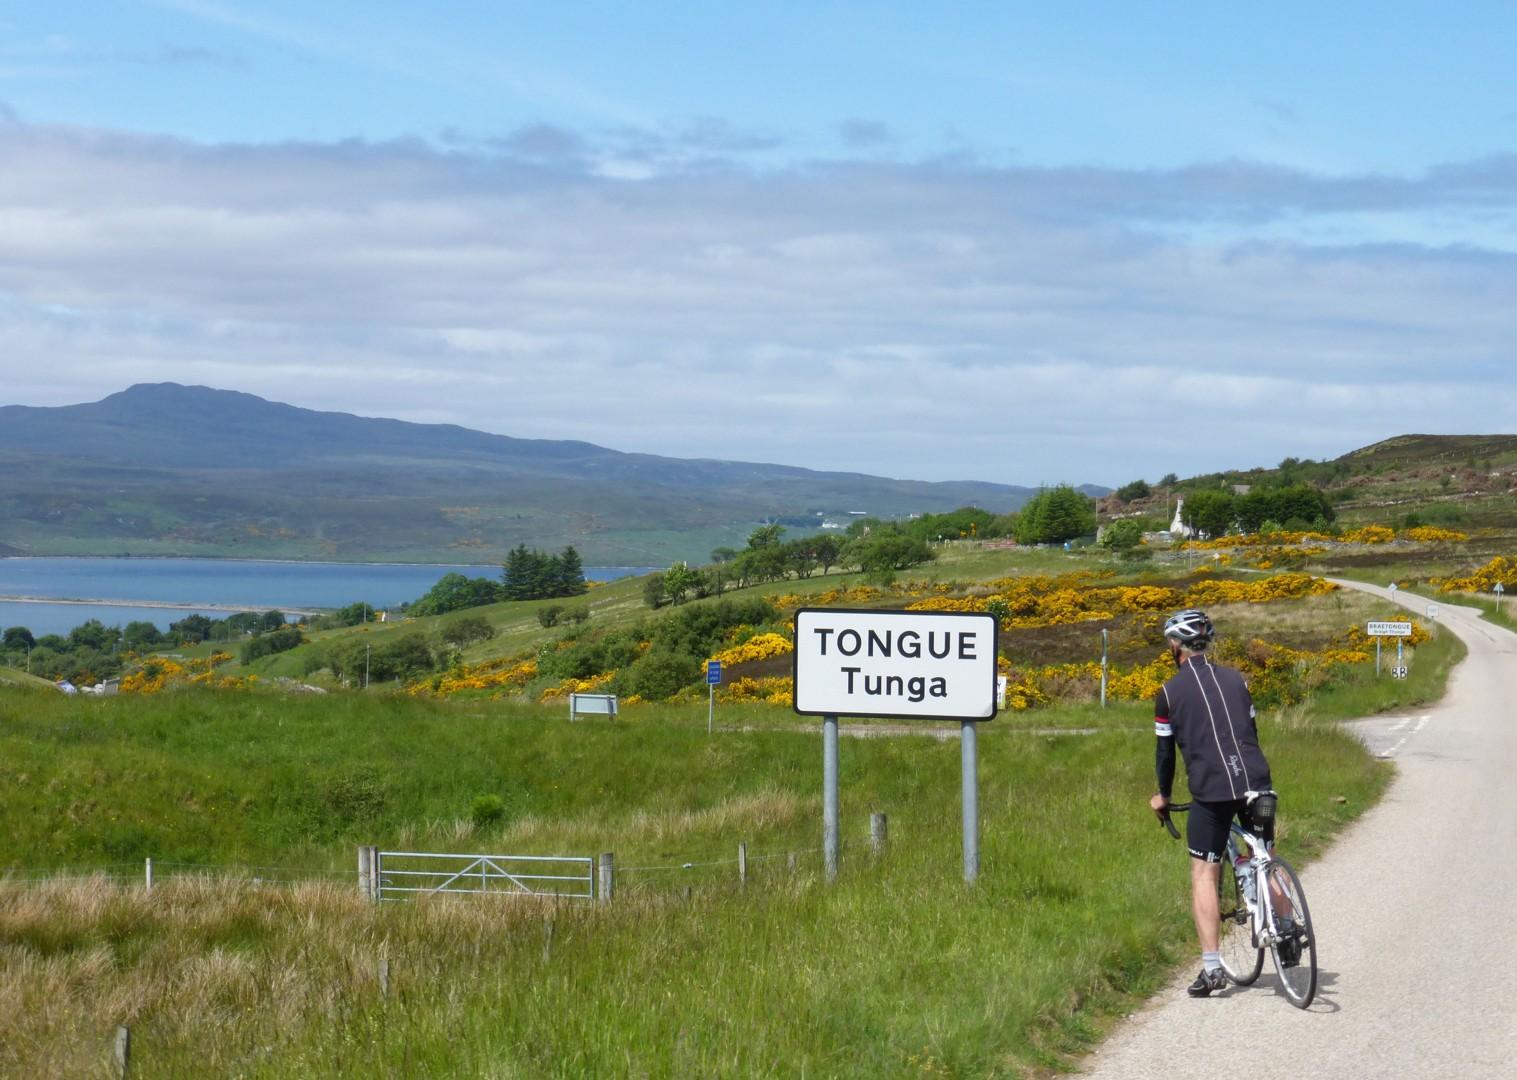 tounge-lands-end-john-ogroats-cycling.jpg - UK - Land's End to John O'Groats Explorer (22 days) - Guided Cycling Holiday - Leisure Cycling